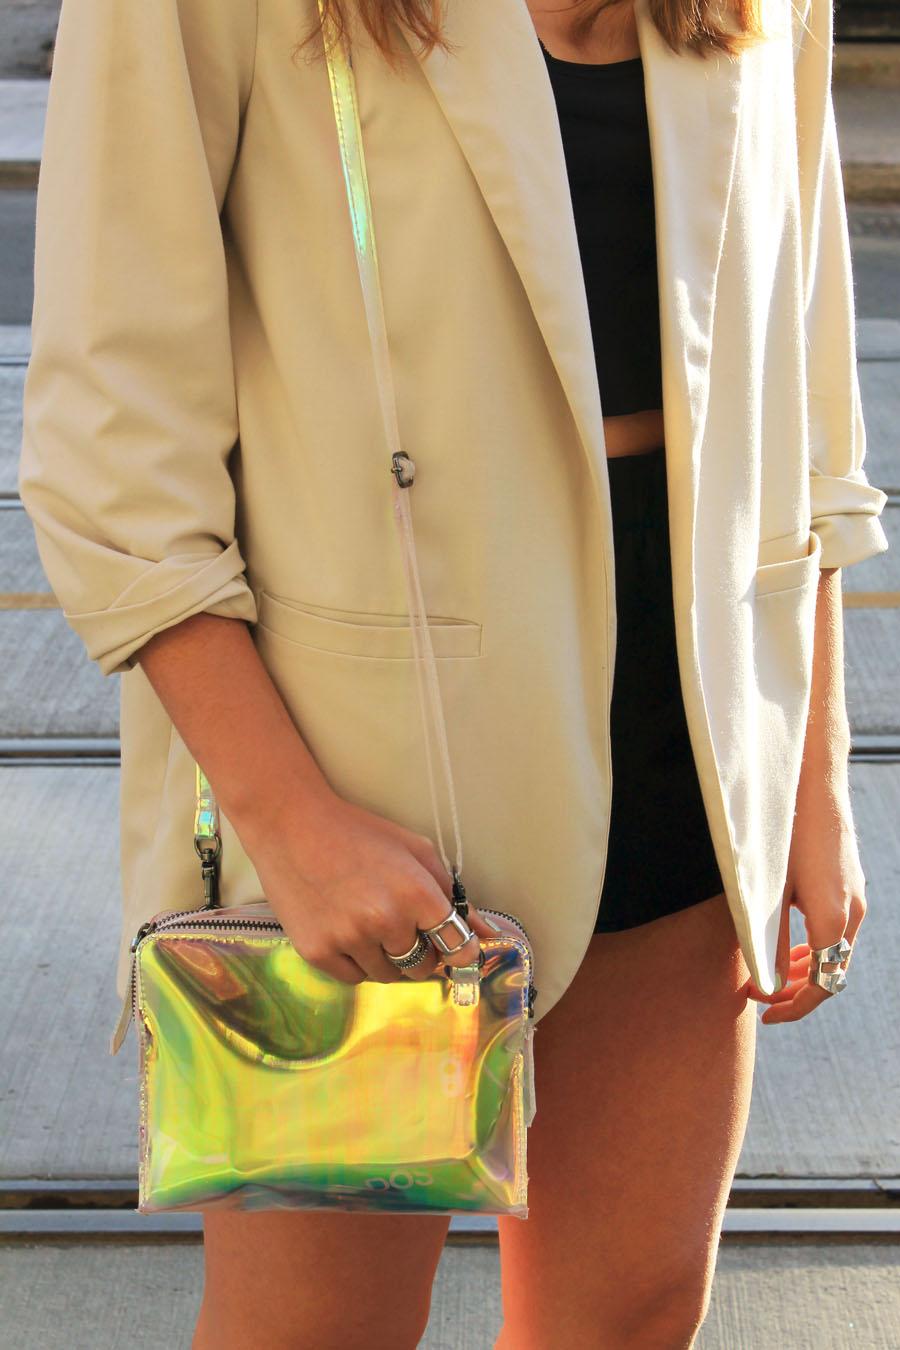 hologram purse h&m style